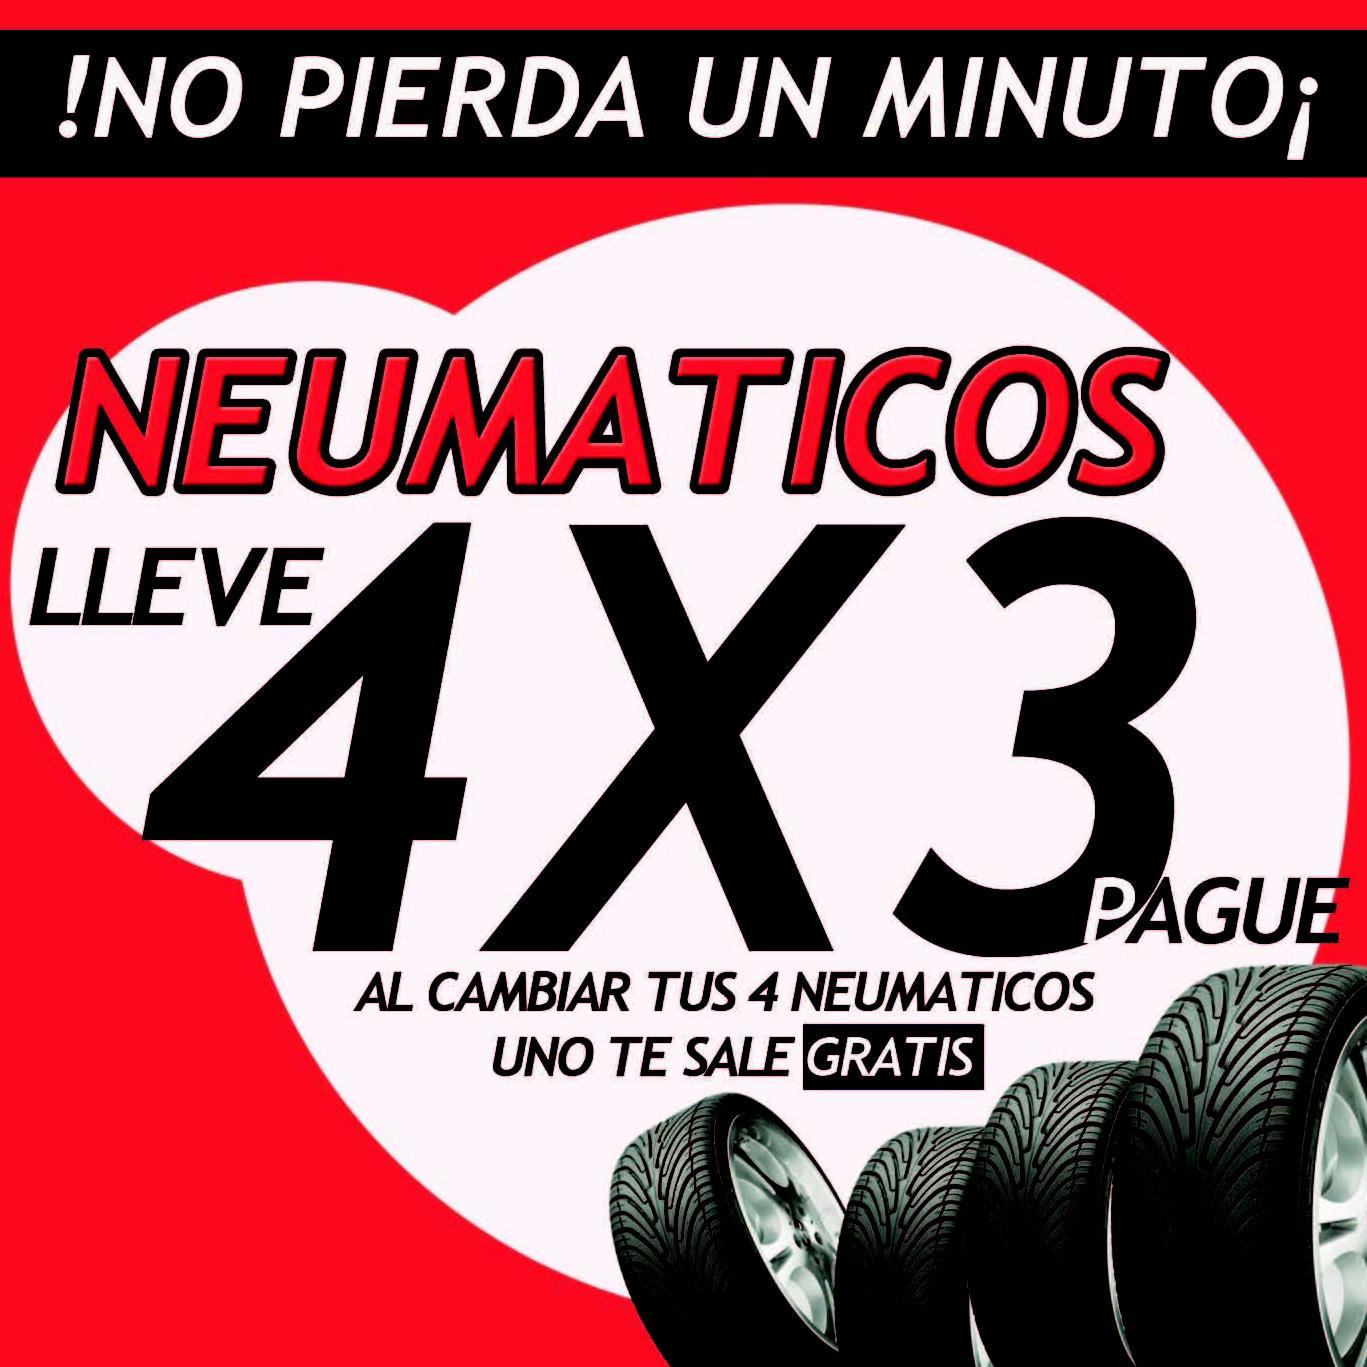 RUEDAS 4X3